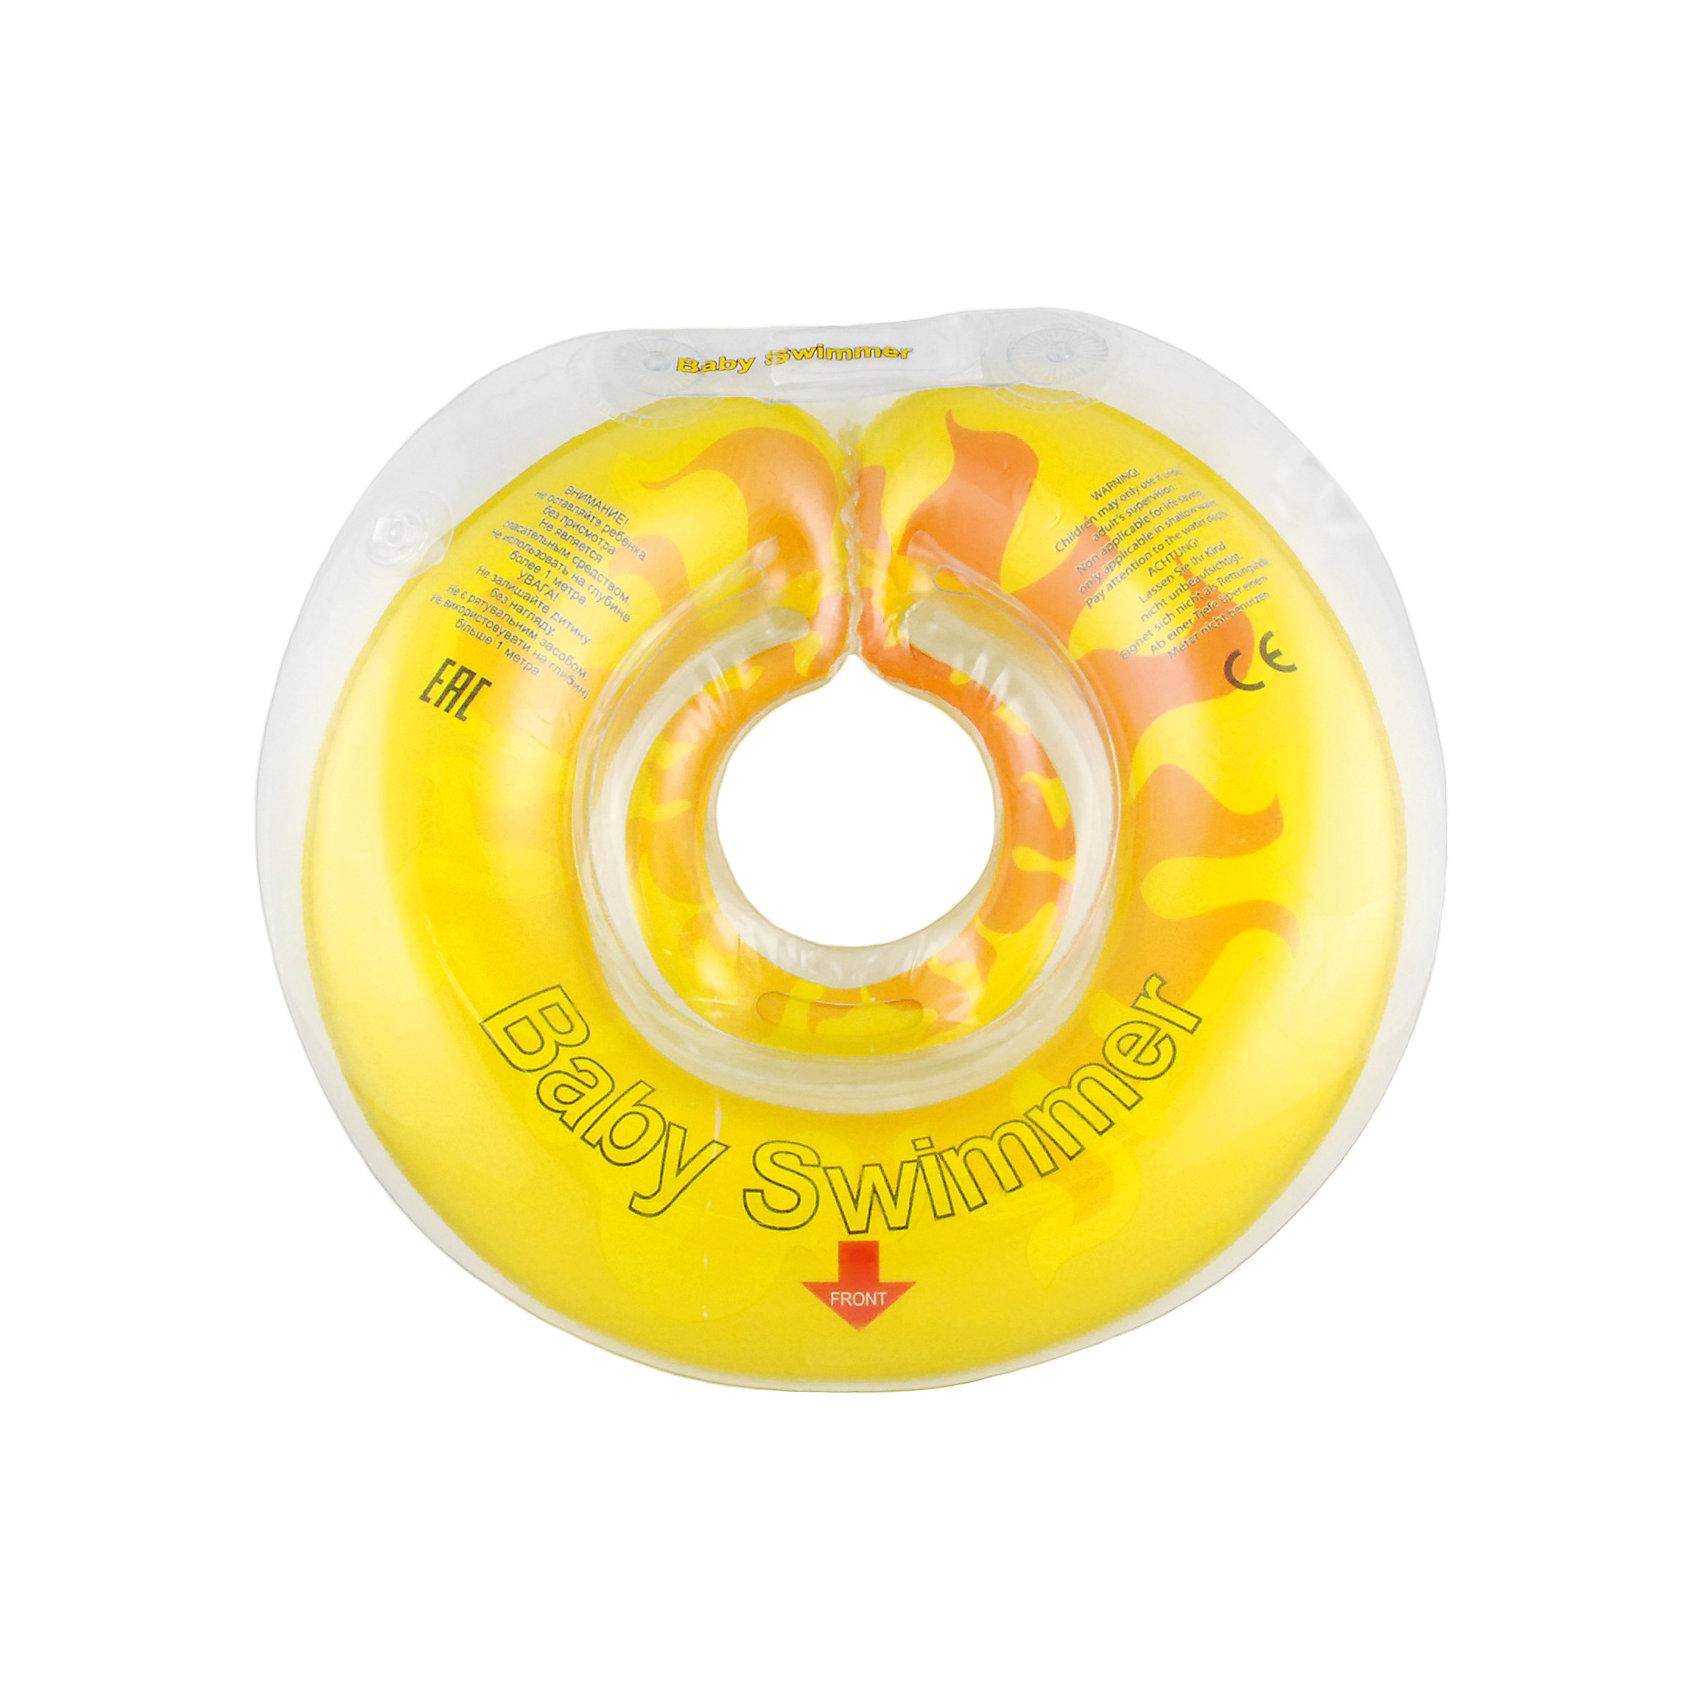 Baby Swimmer Круг для купания Солнышко BabySwimmer, желтый круг для купания младенцев flipper отзывы